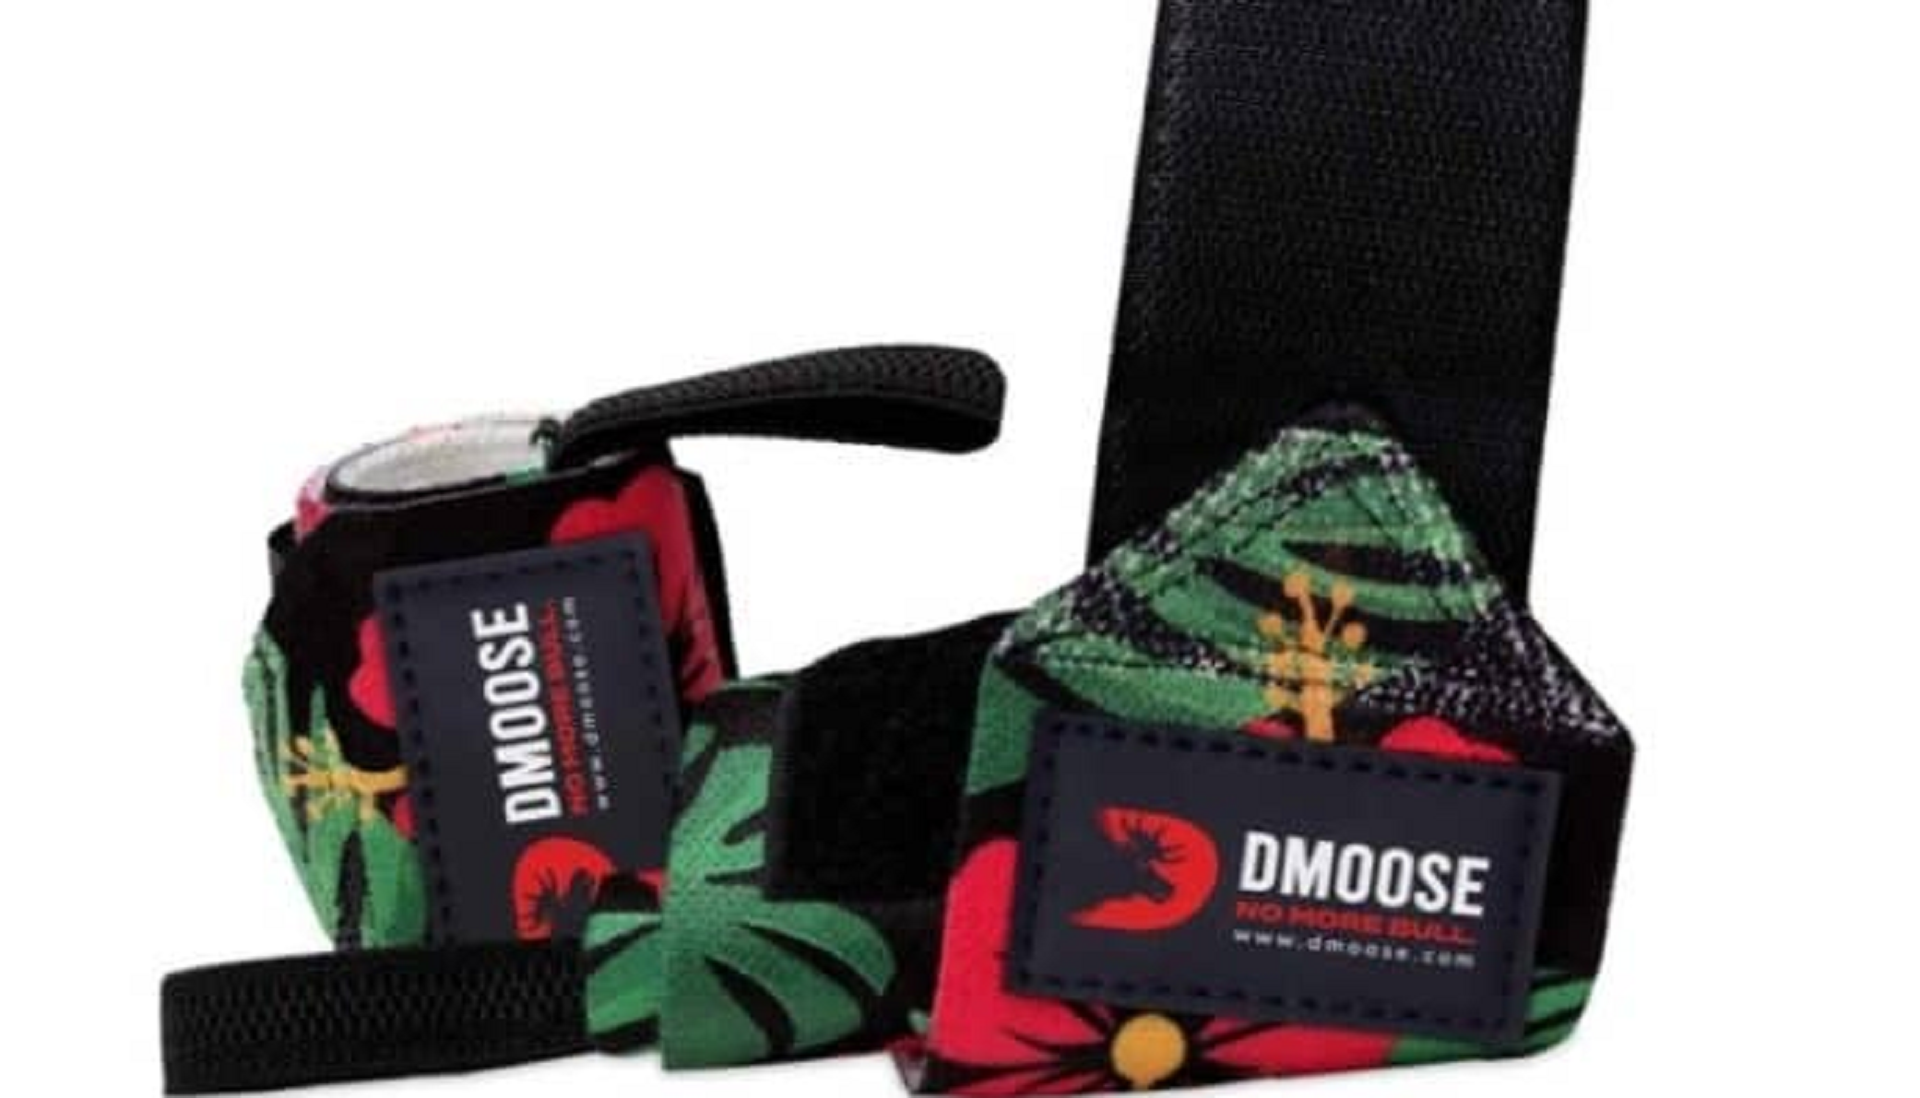 dmoose wrist wraps